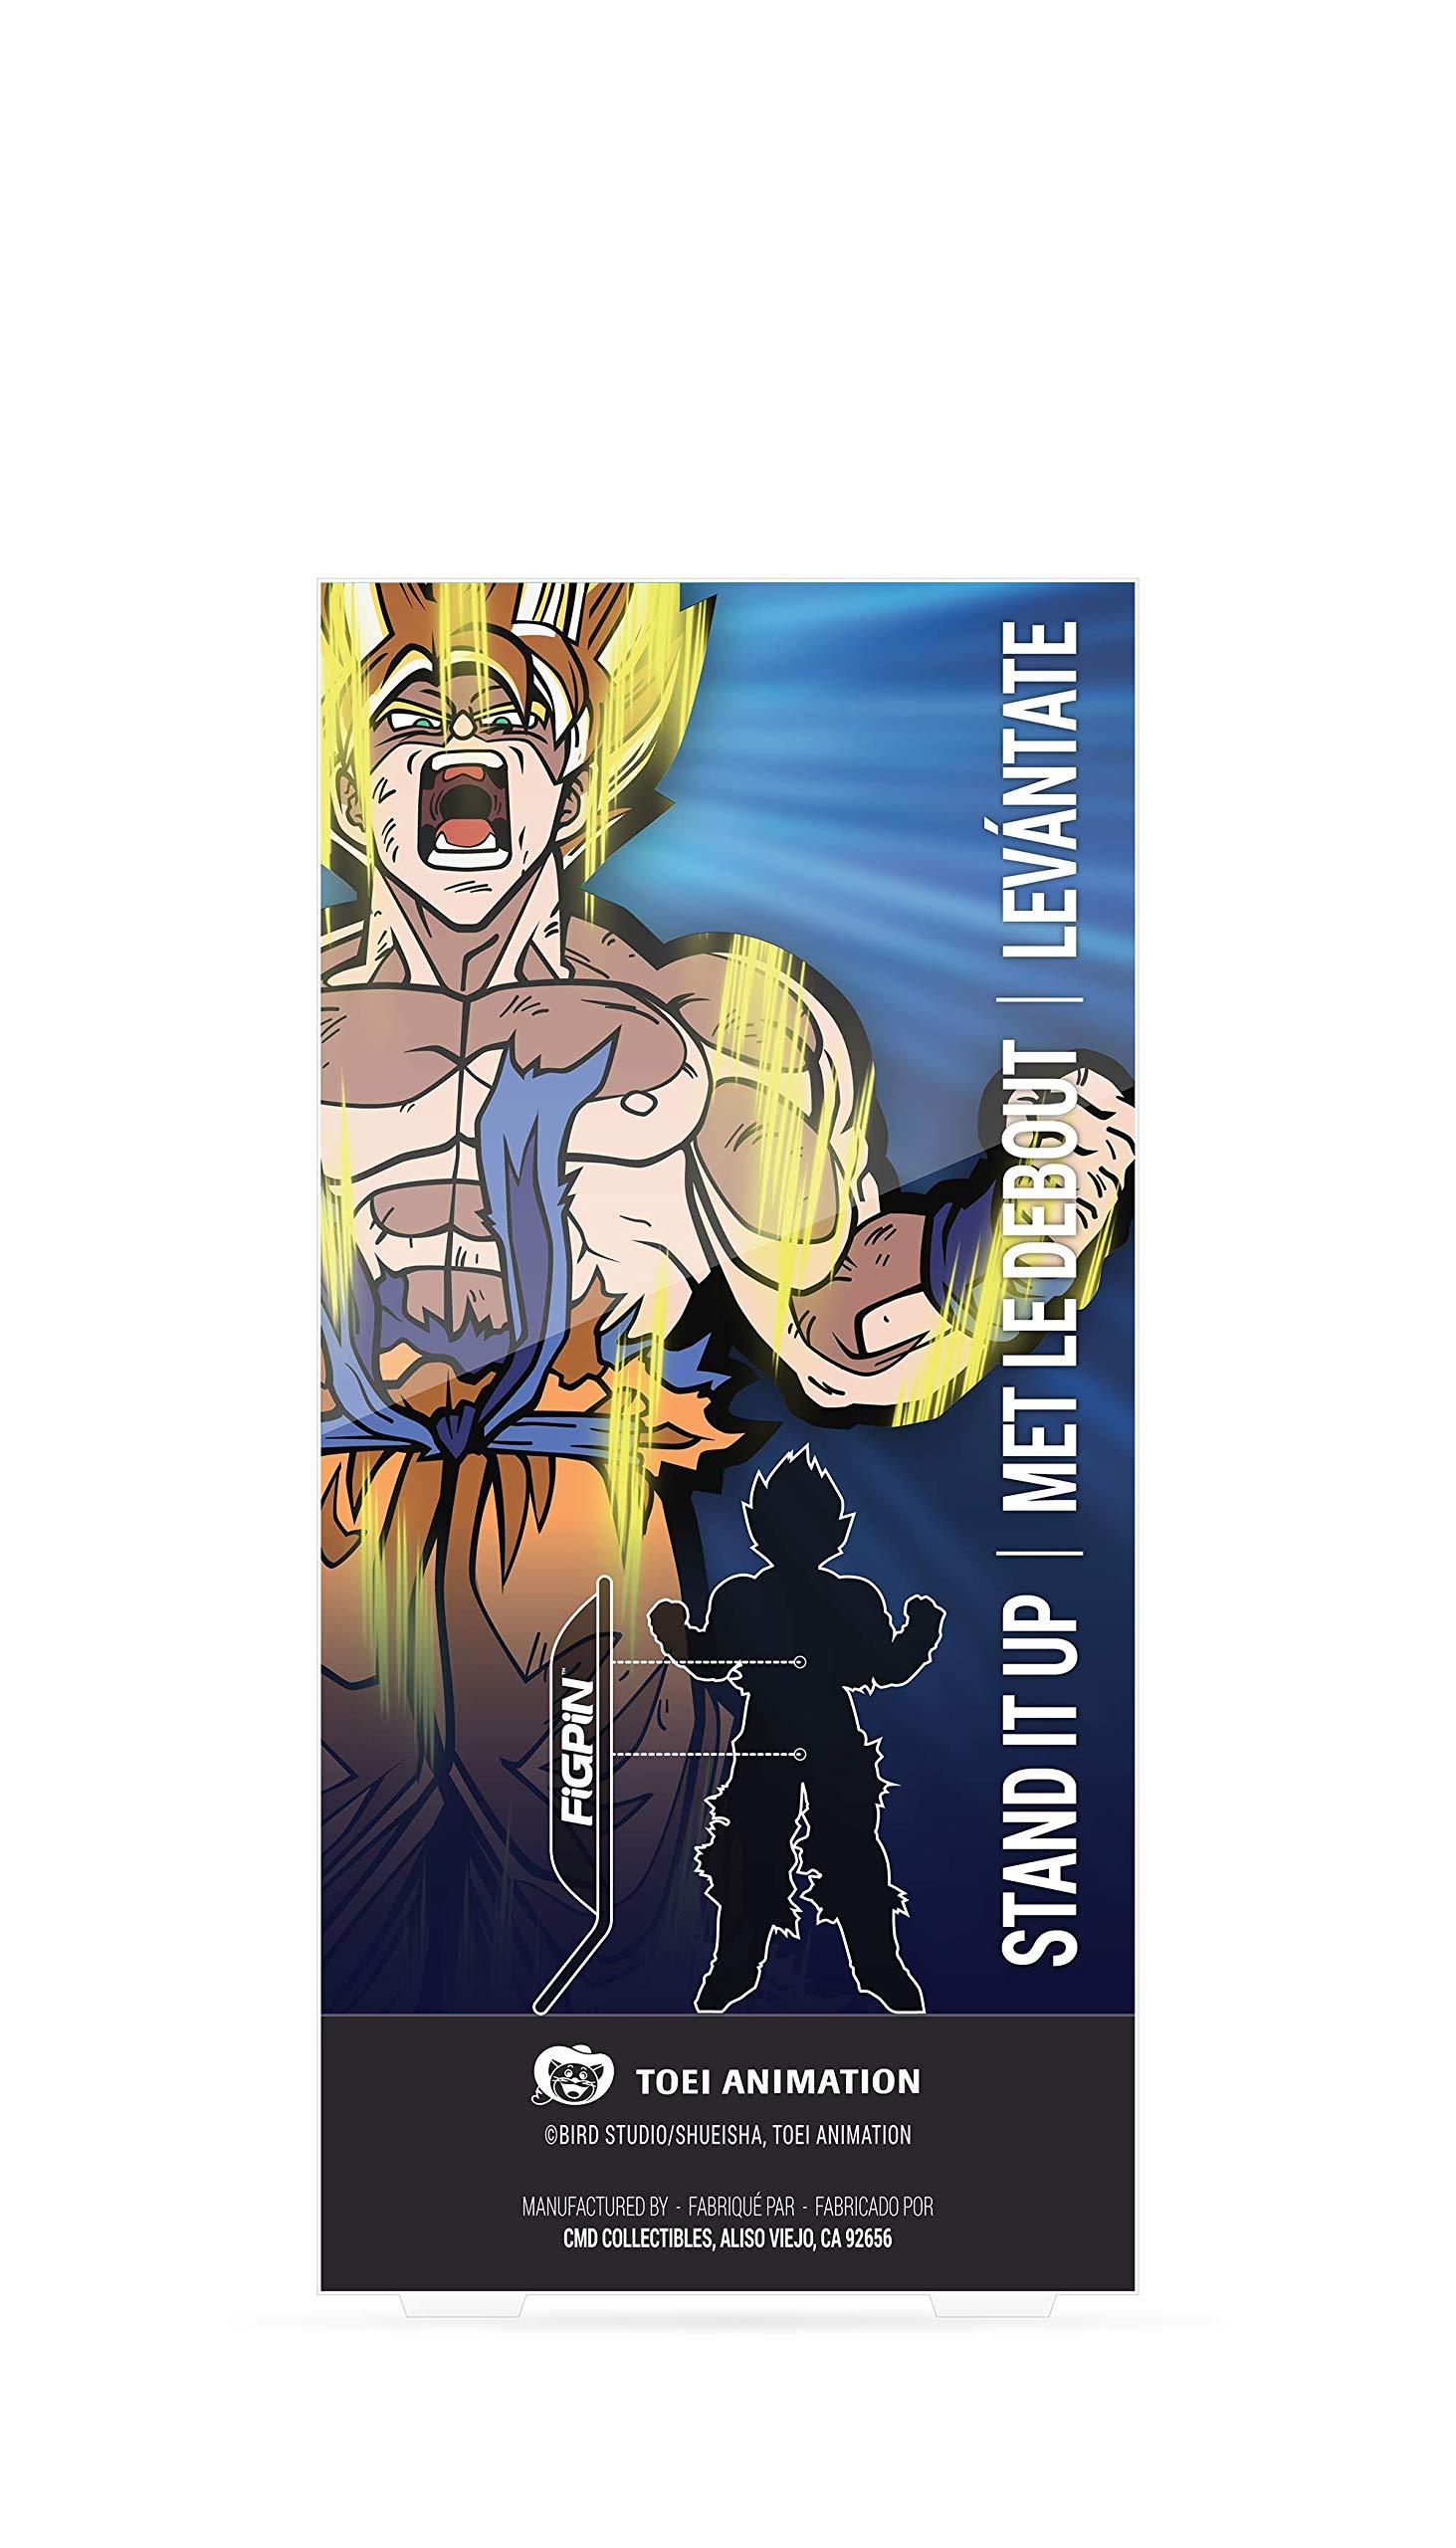 FiGPiN XL Dragon Ball Z: Super Saiyan Goku - Collectible Pin by FiGPiN (Image #2)